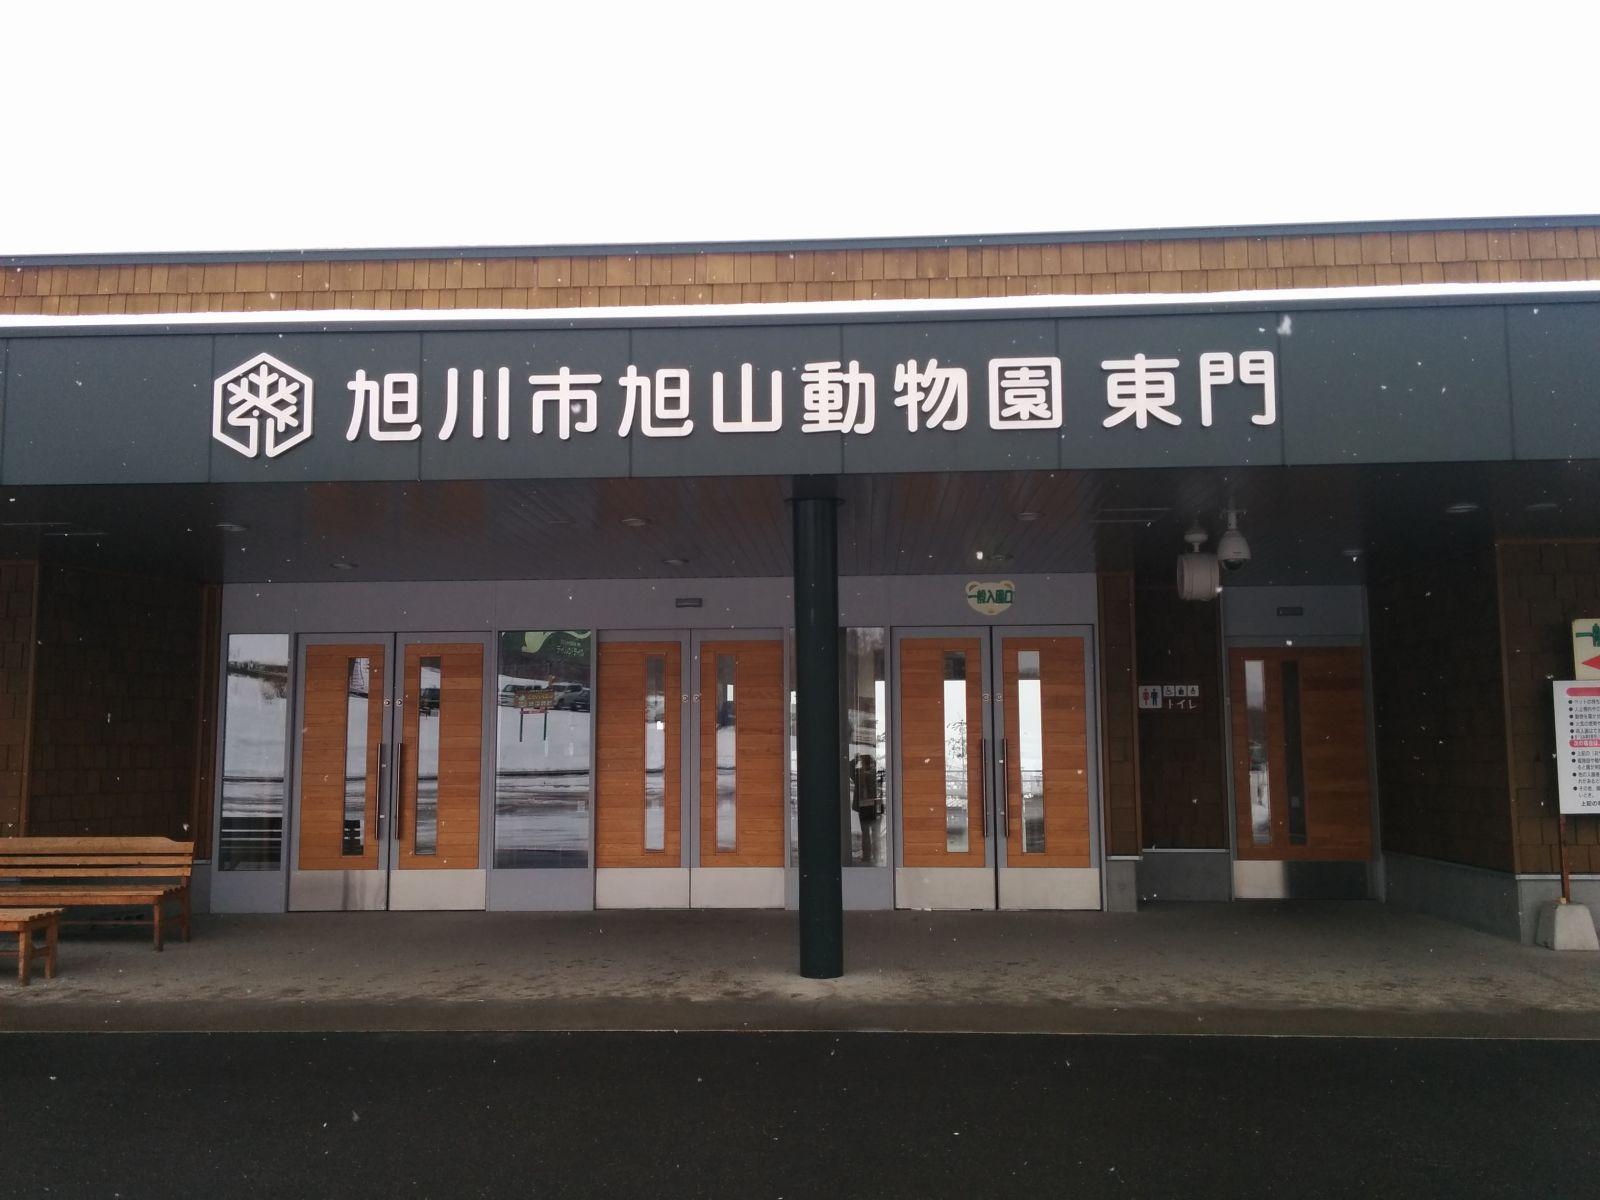 【旭川】旭川市旭山動物園観光写真です。